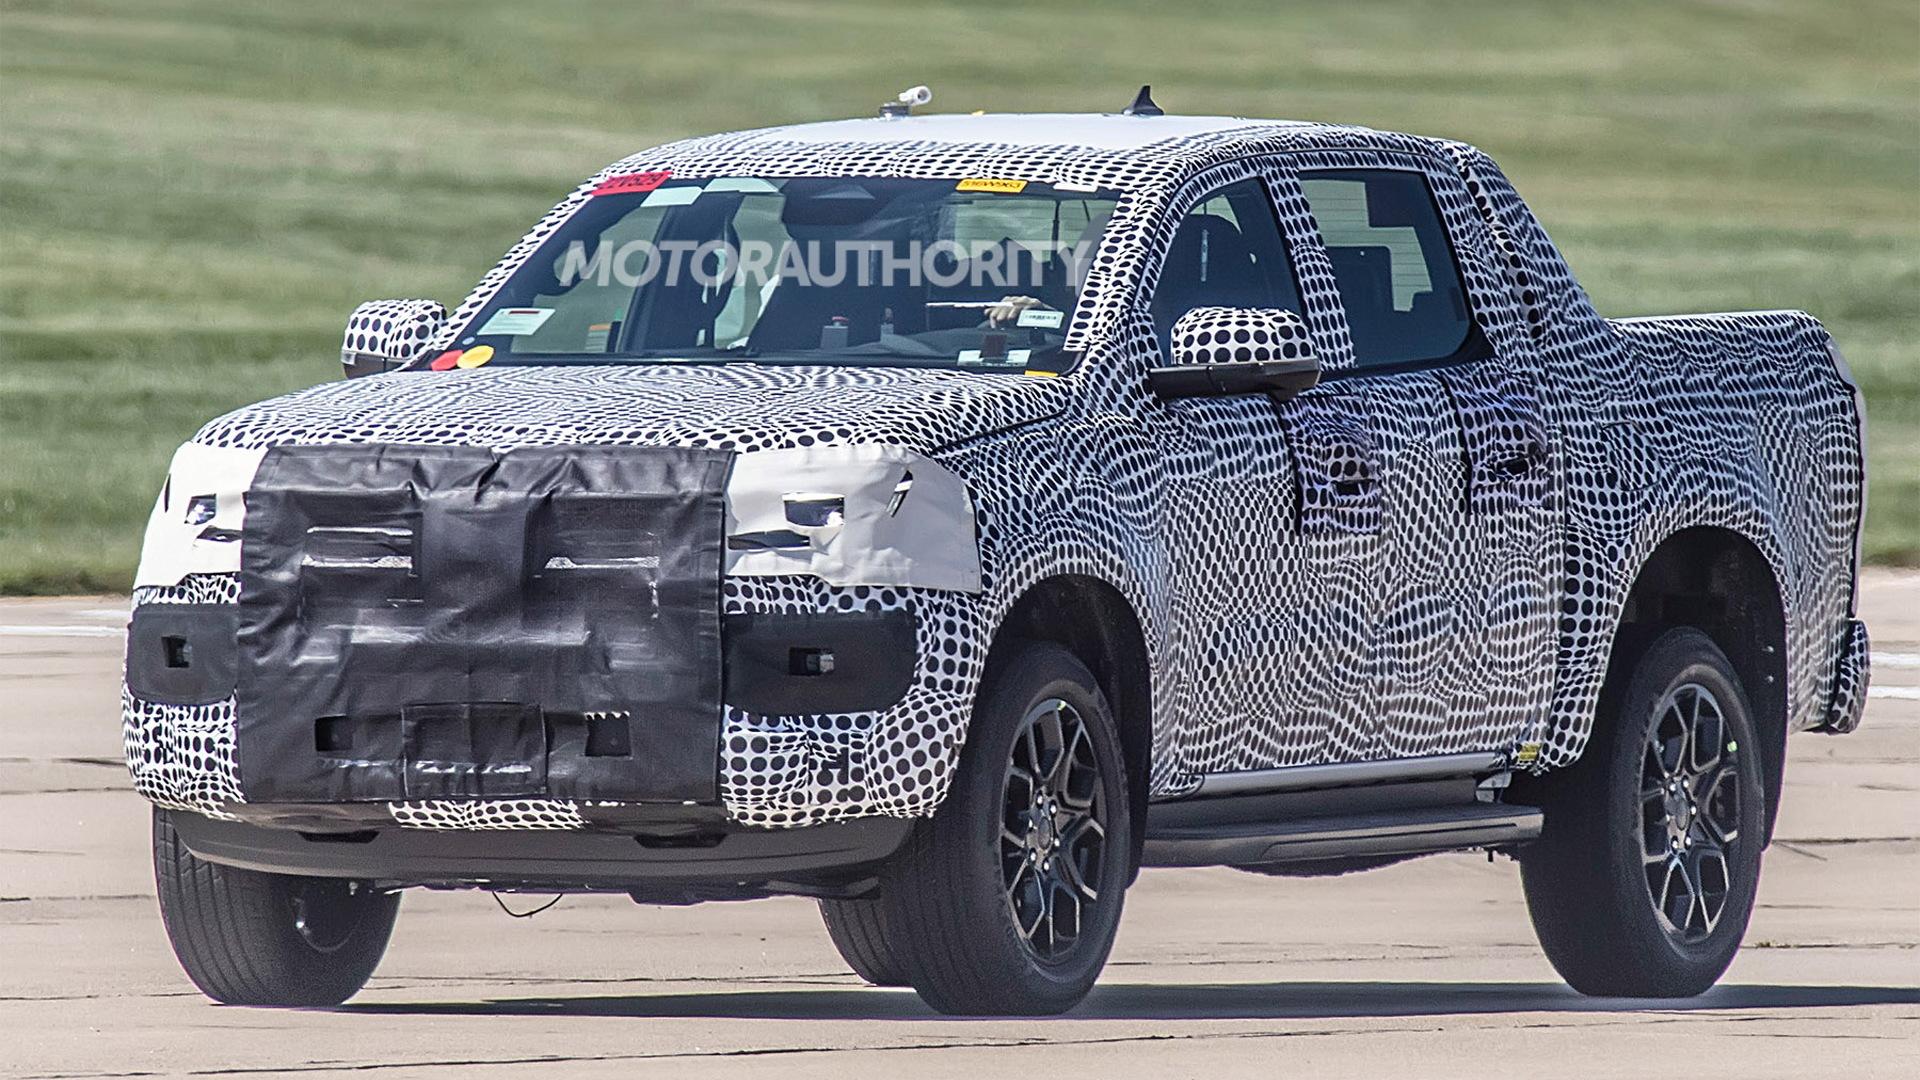 2022 Volkswagen Amarok spy shots – Photo credit:S. Baldauf/SB-Medien